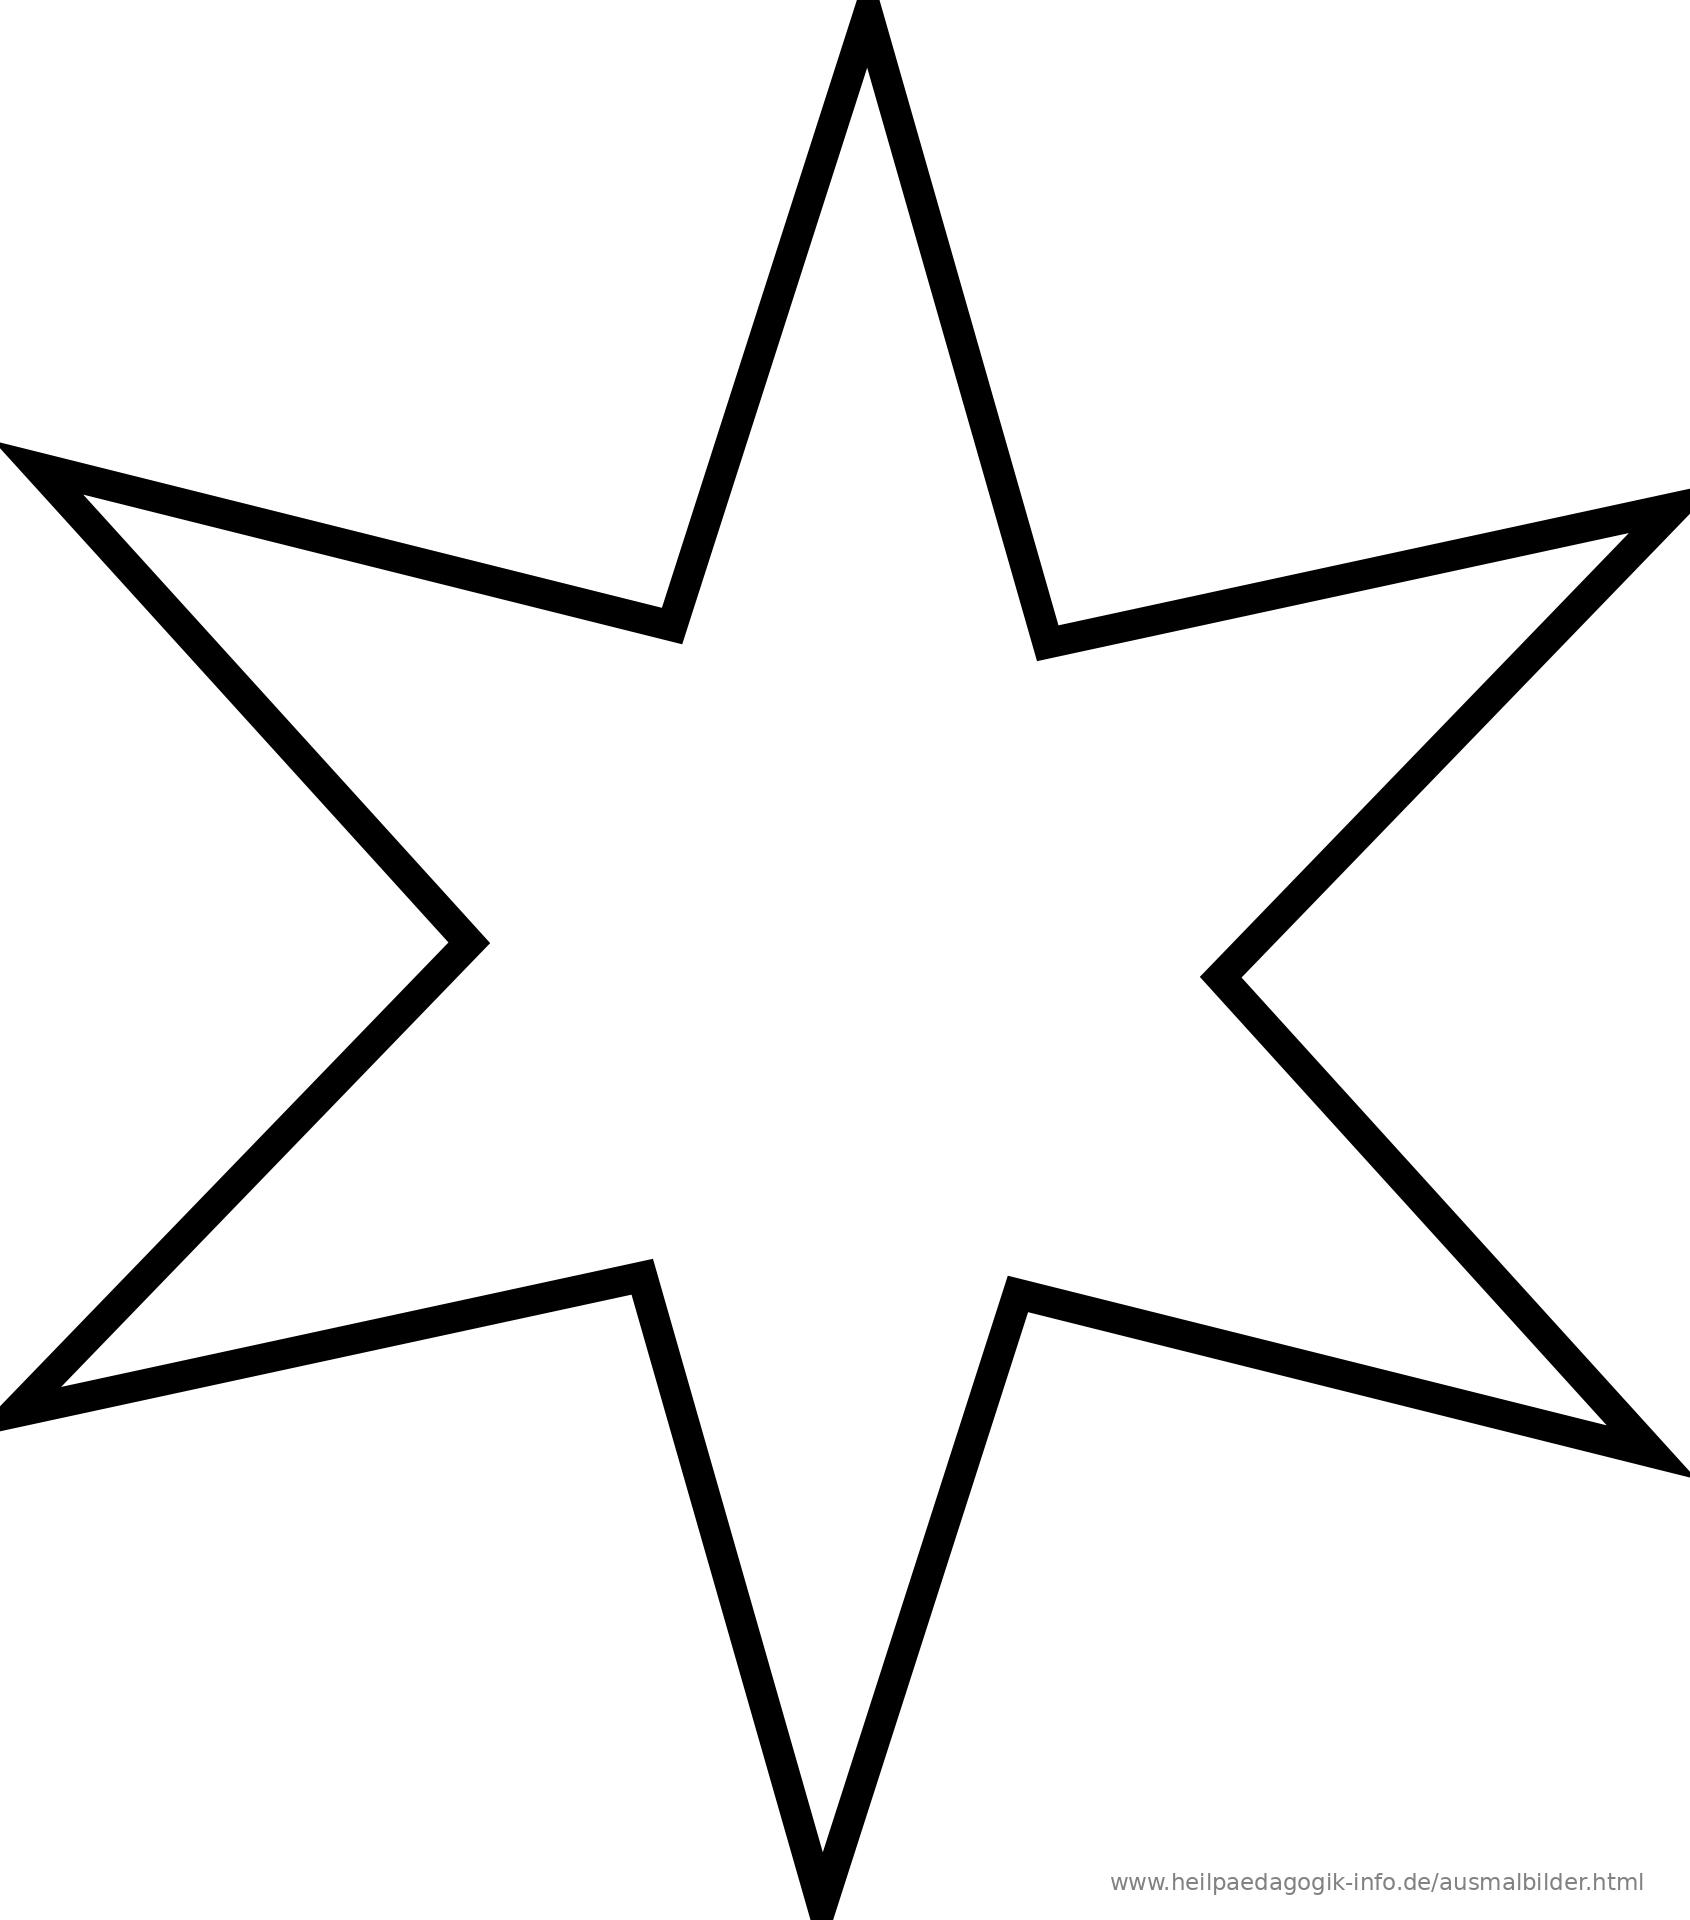 Ausmalbilder Sterne